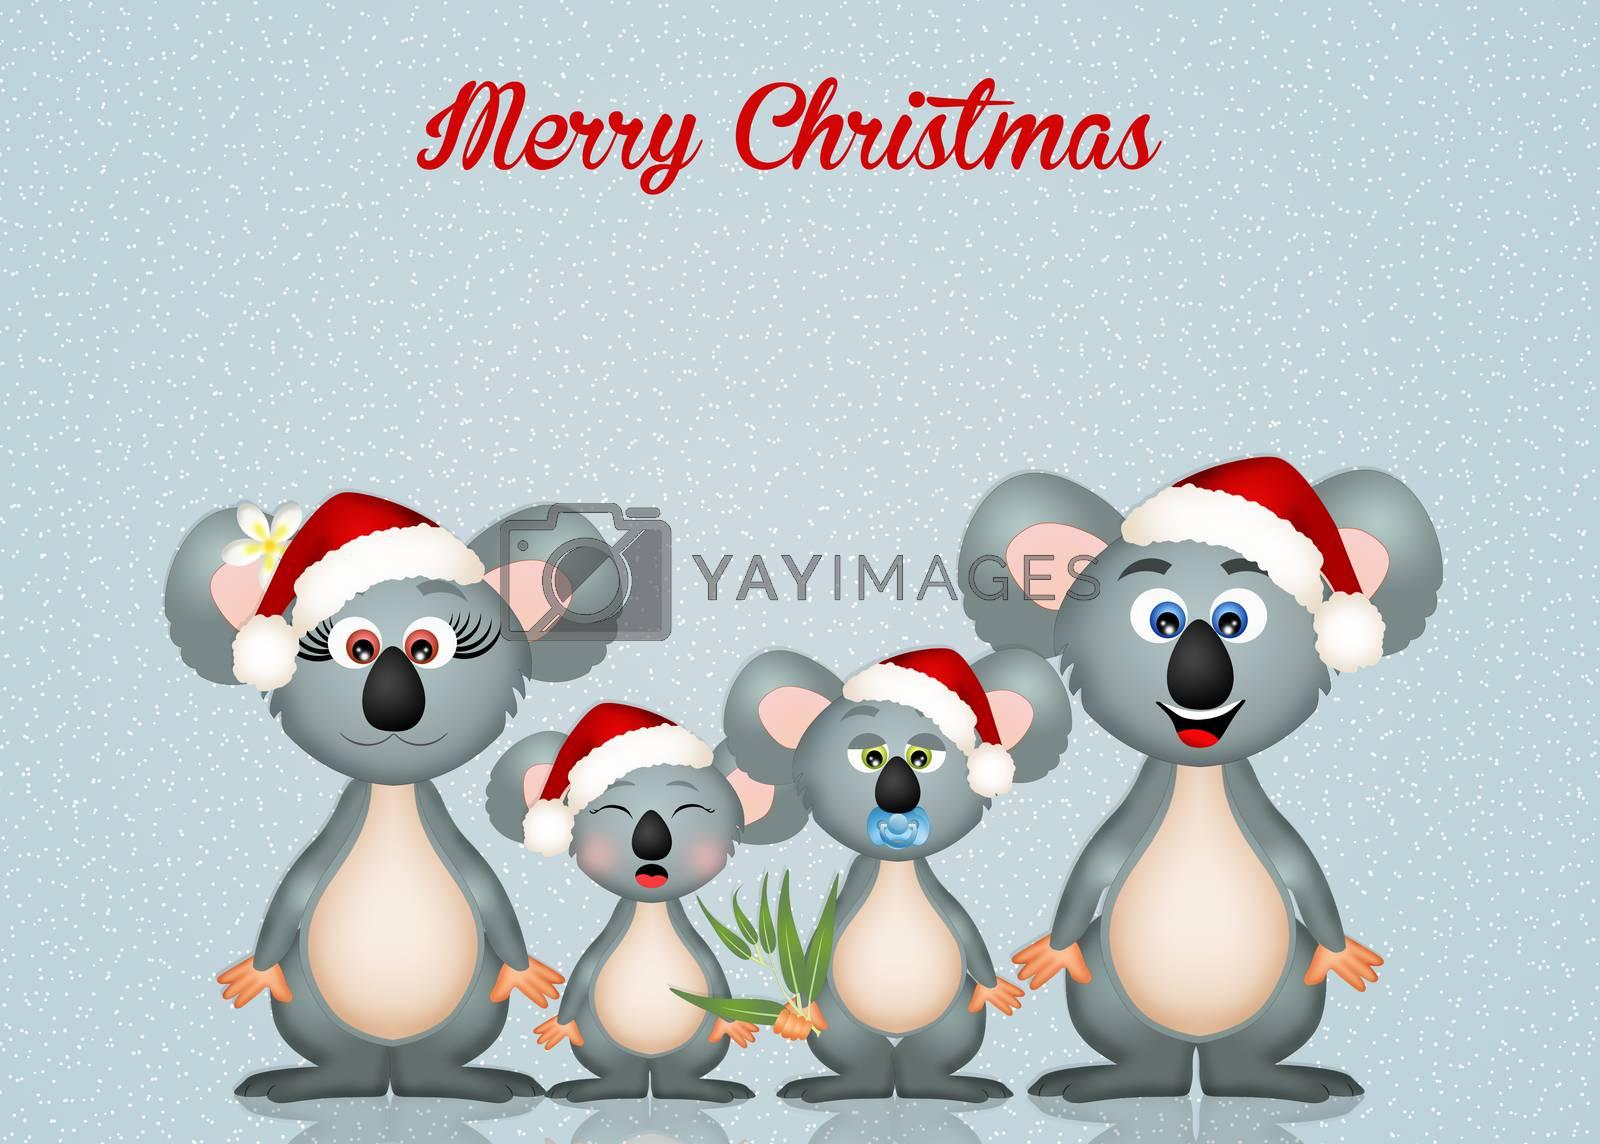 illustration of koalas at Christmas